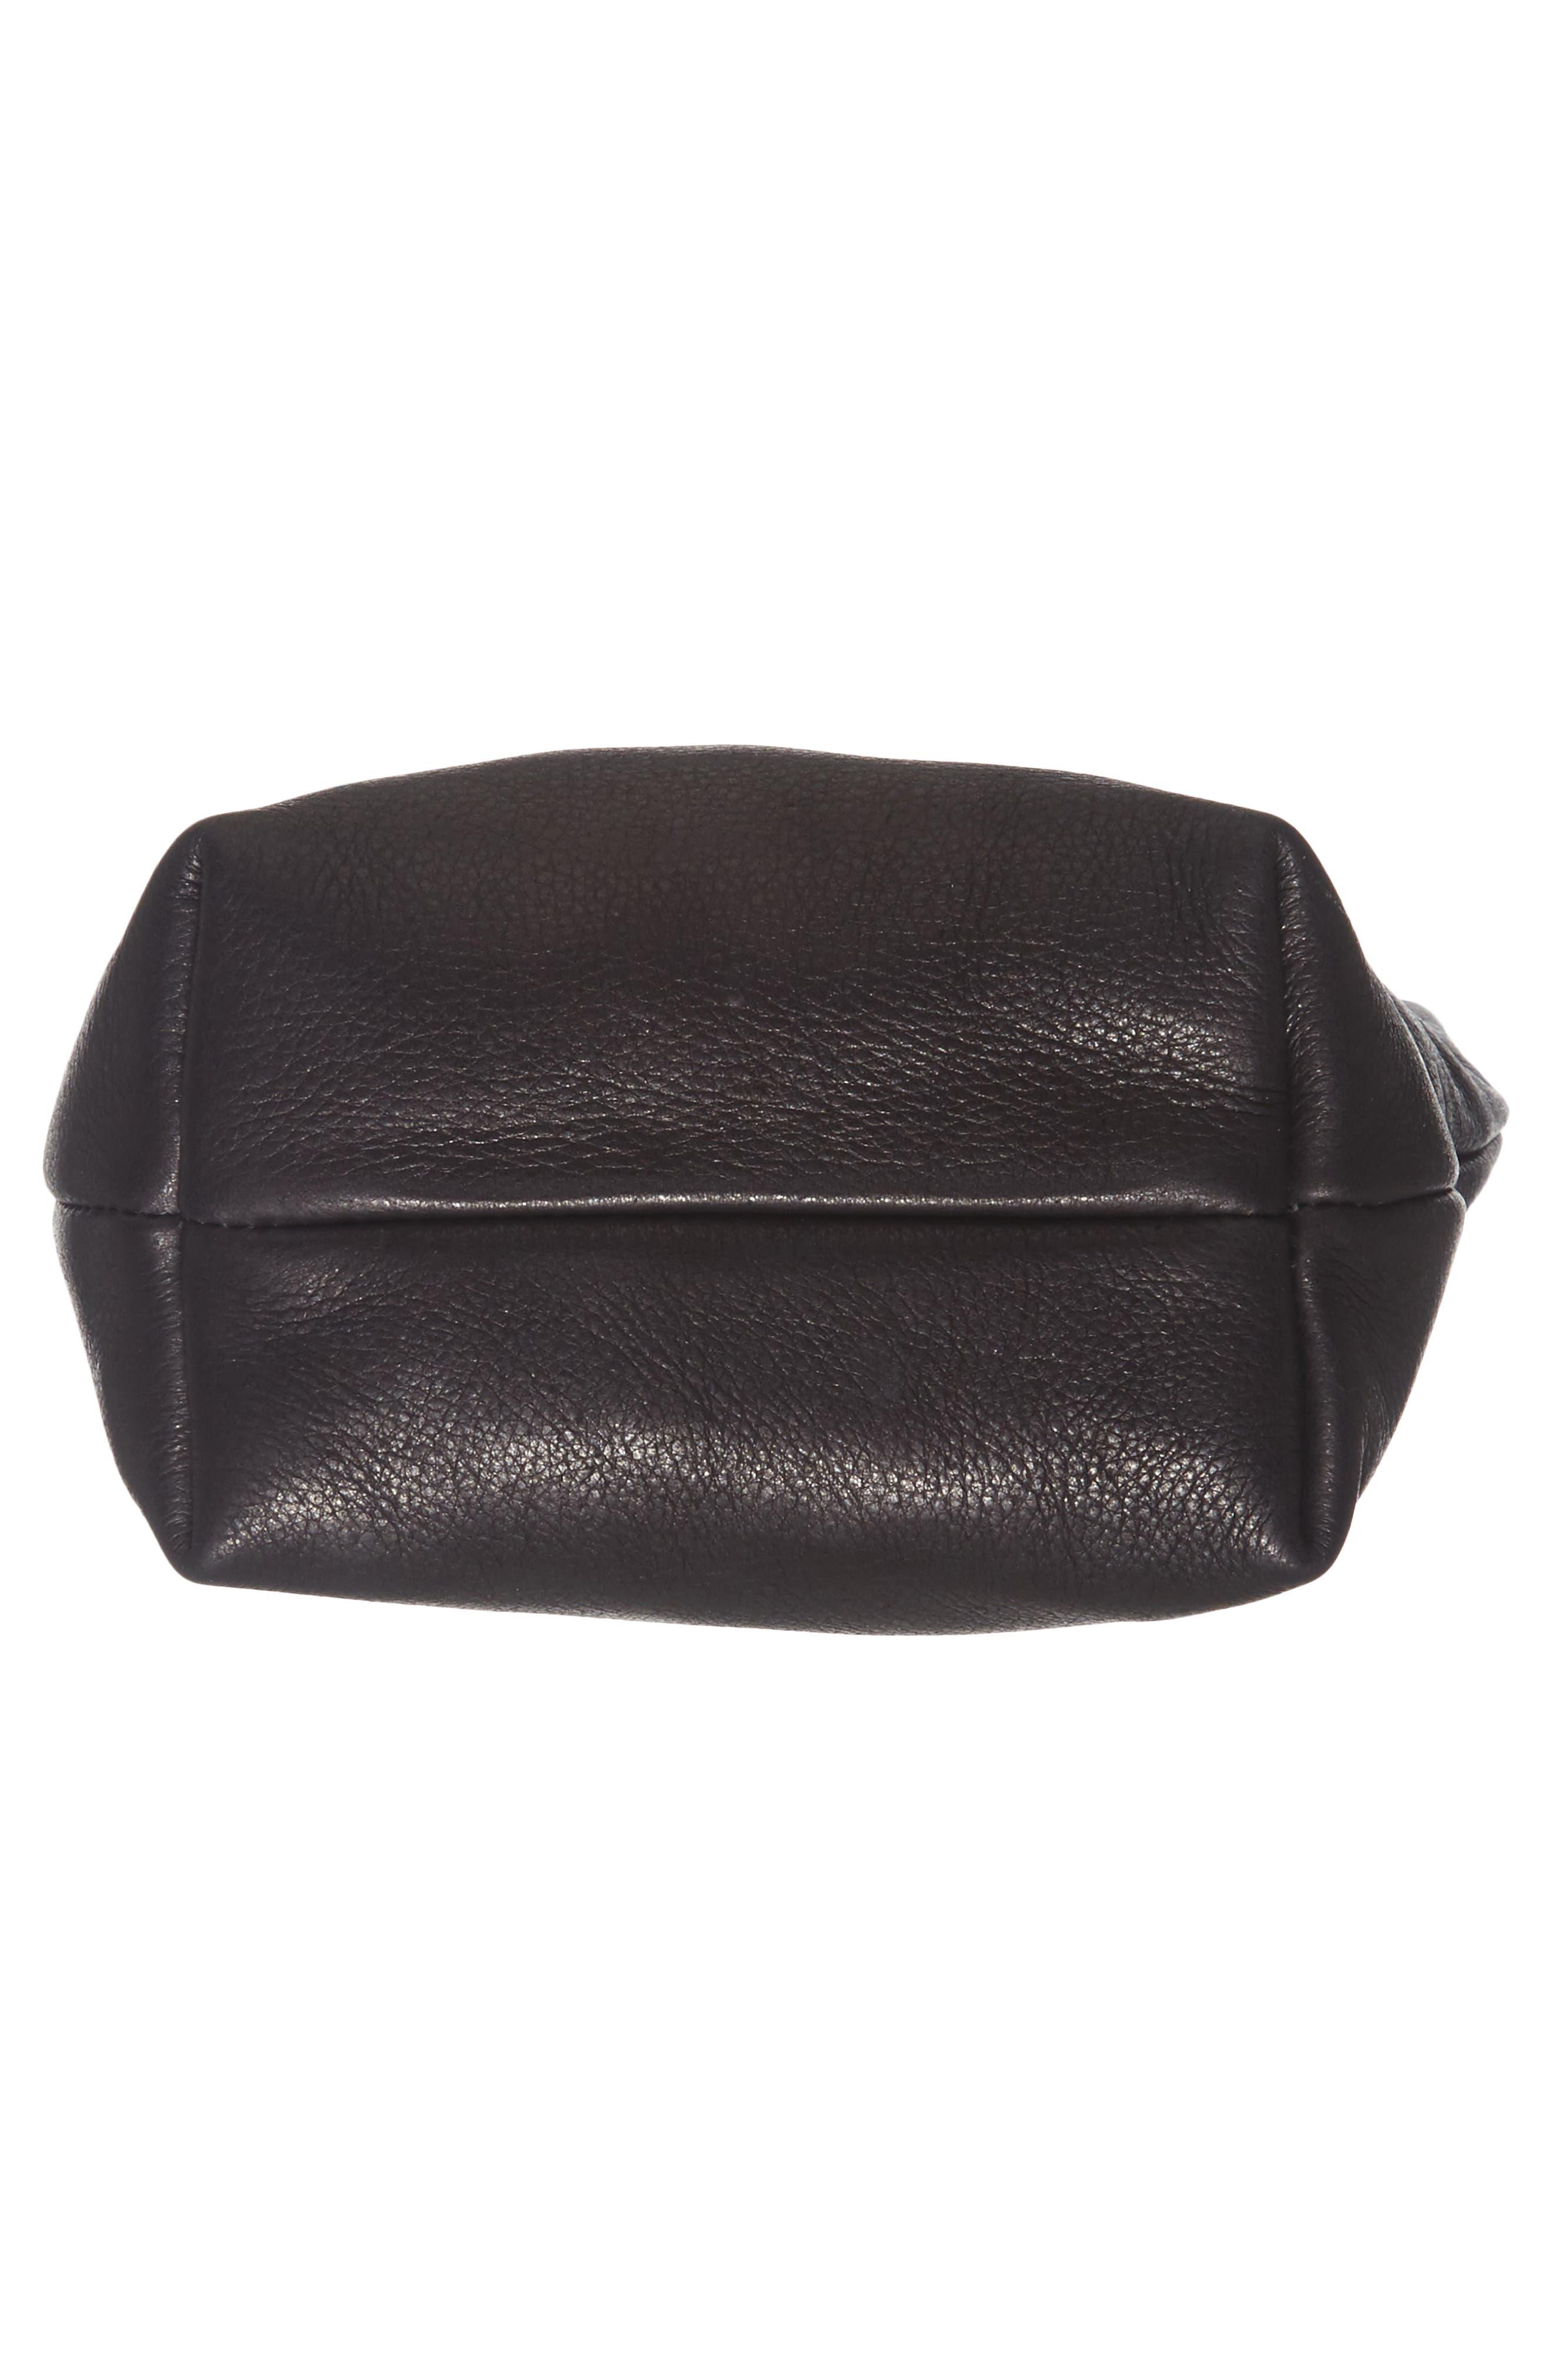 Leather Crossbody Bag,                             Alternate thumbnail 6, color,                             001